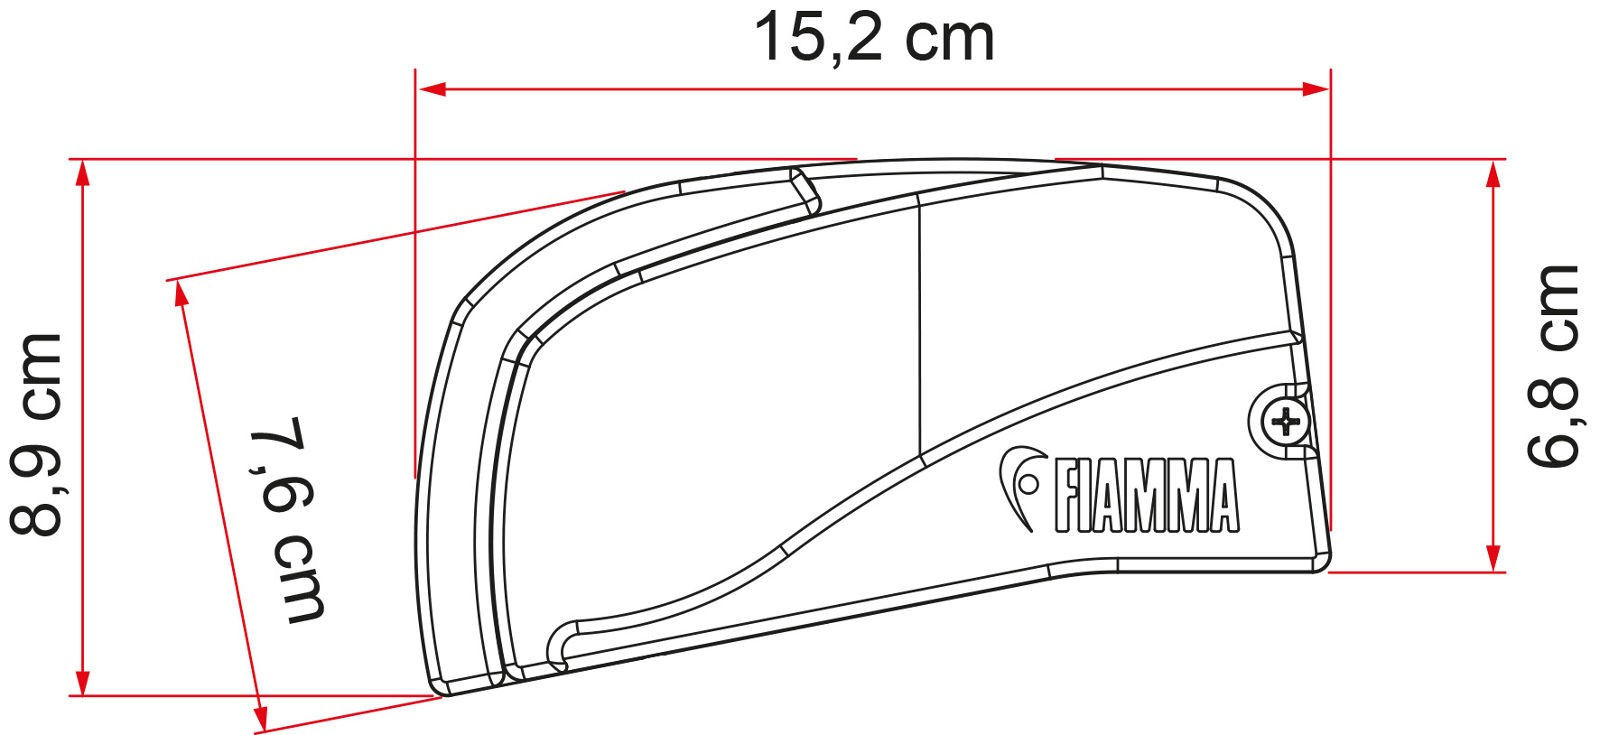 Fiamma F40van 270 Campervan Awning For Swb T5 Amp T6 Wiring Diagram F40 Van Case Dimensions